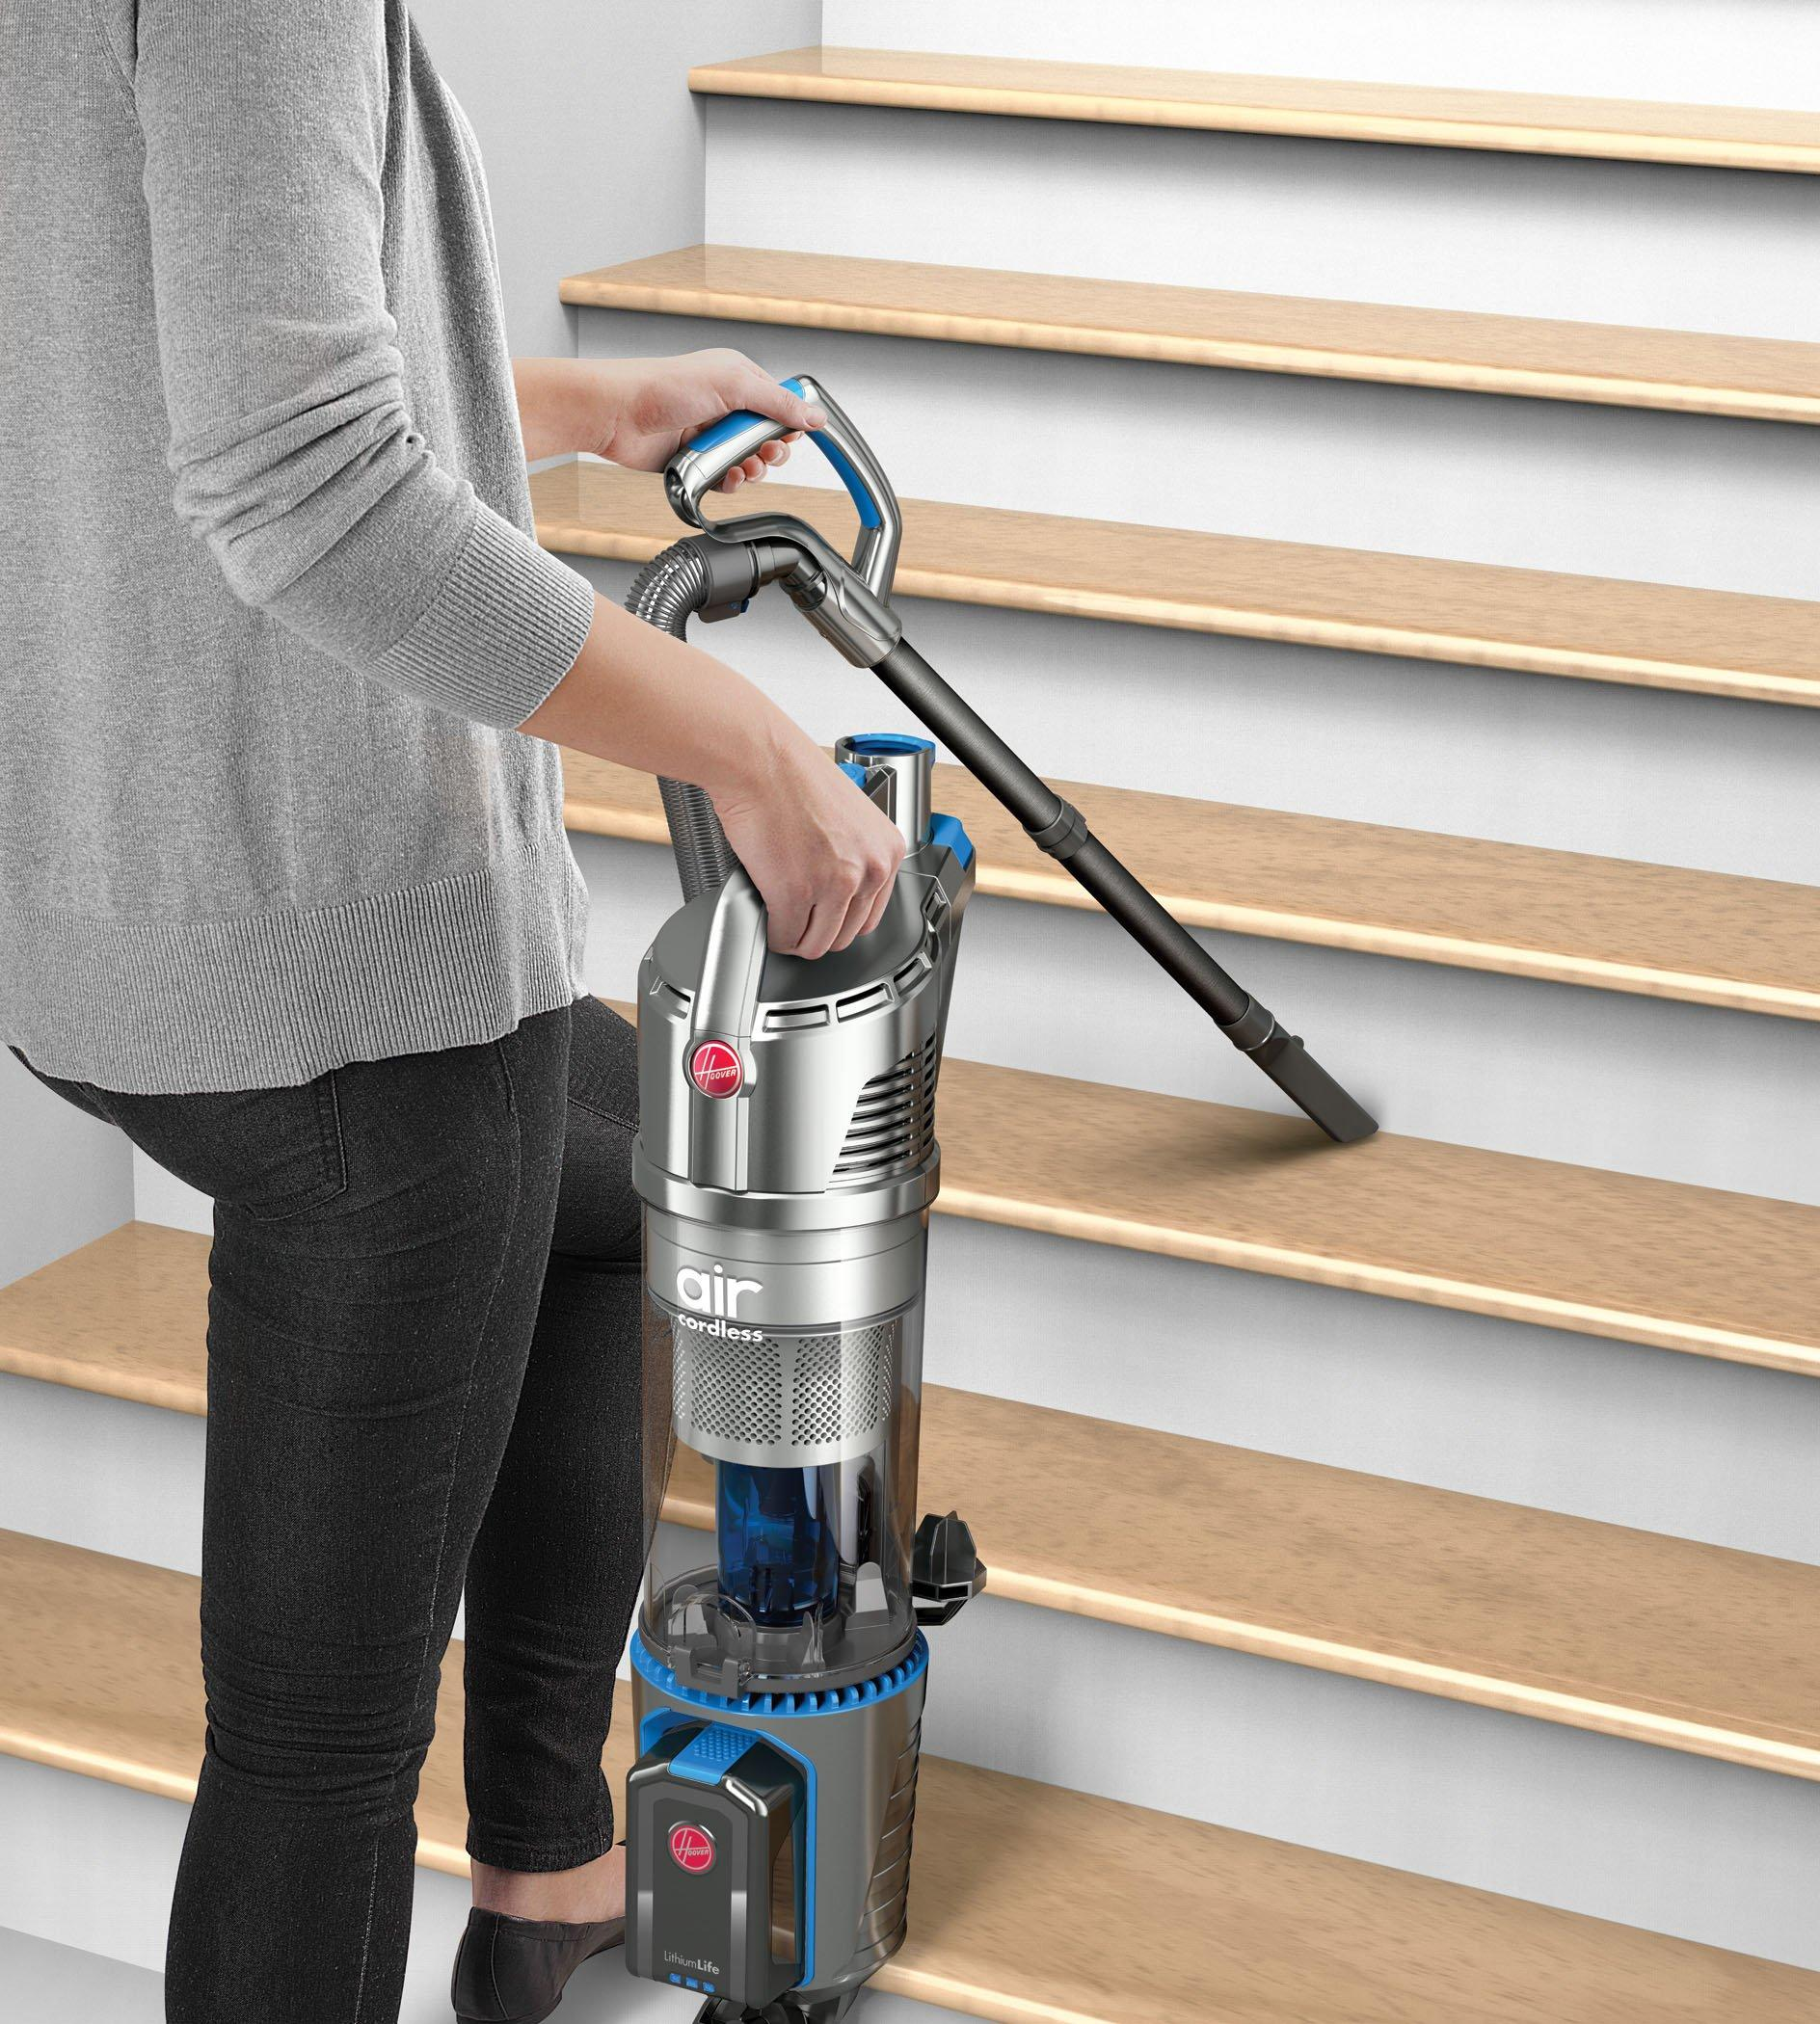 Air Cordless Deluxe Upright Vacuum with Bonus Tools5